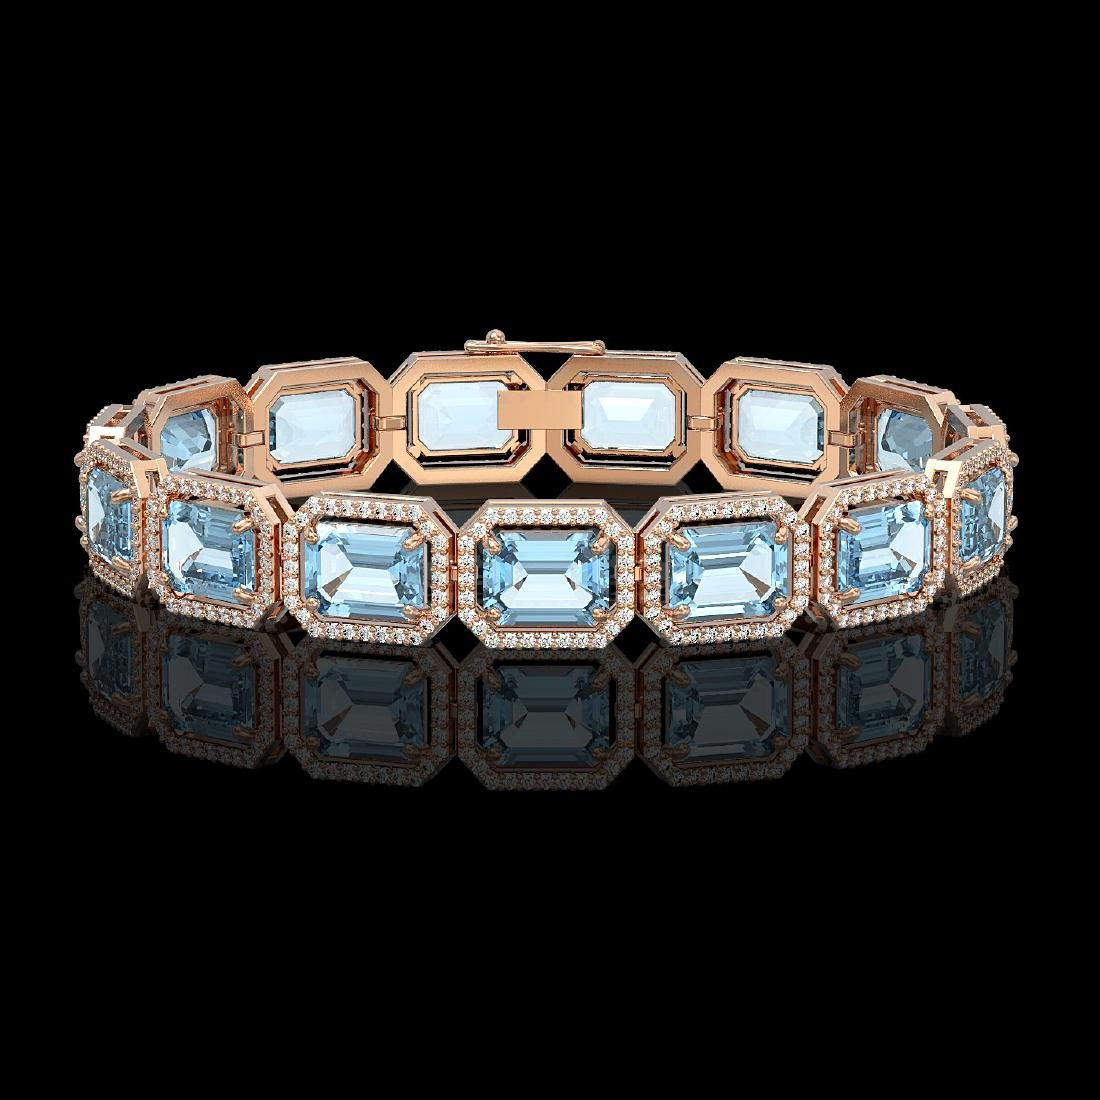 36.81 CTW Aquamarine & Diamond Halo Bracelet 10K Rose